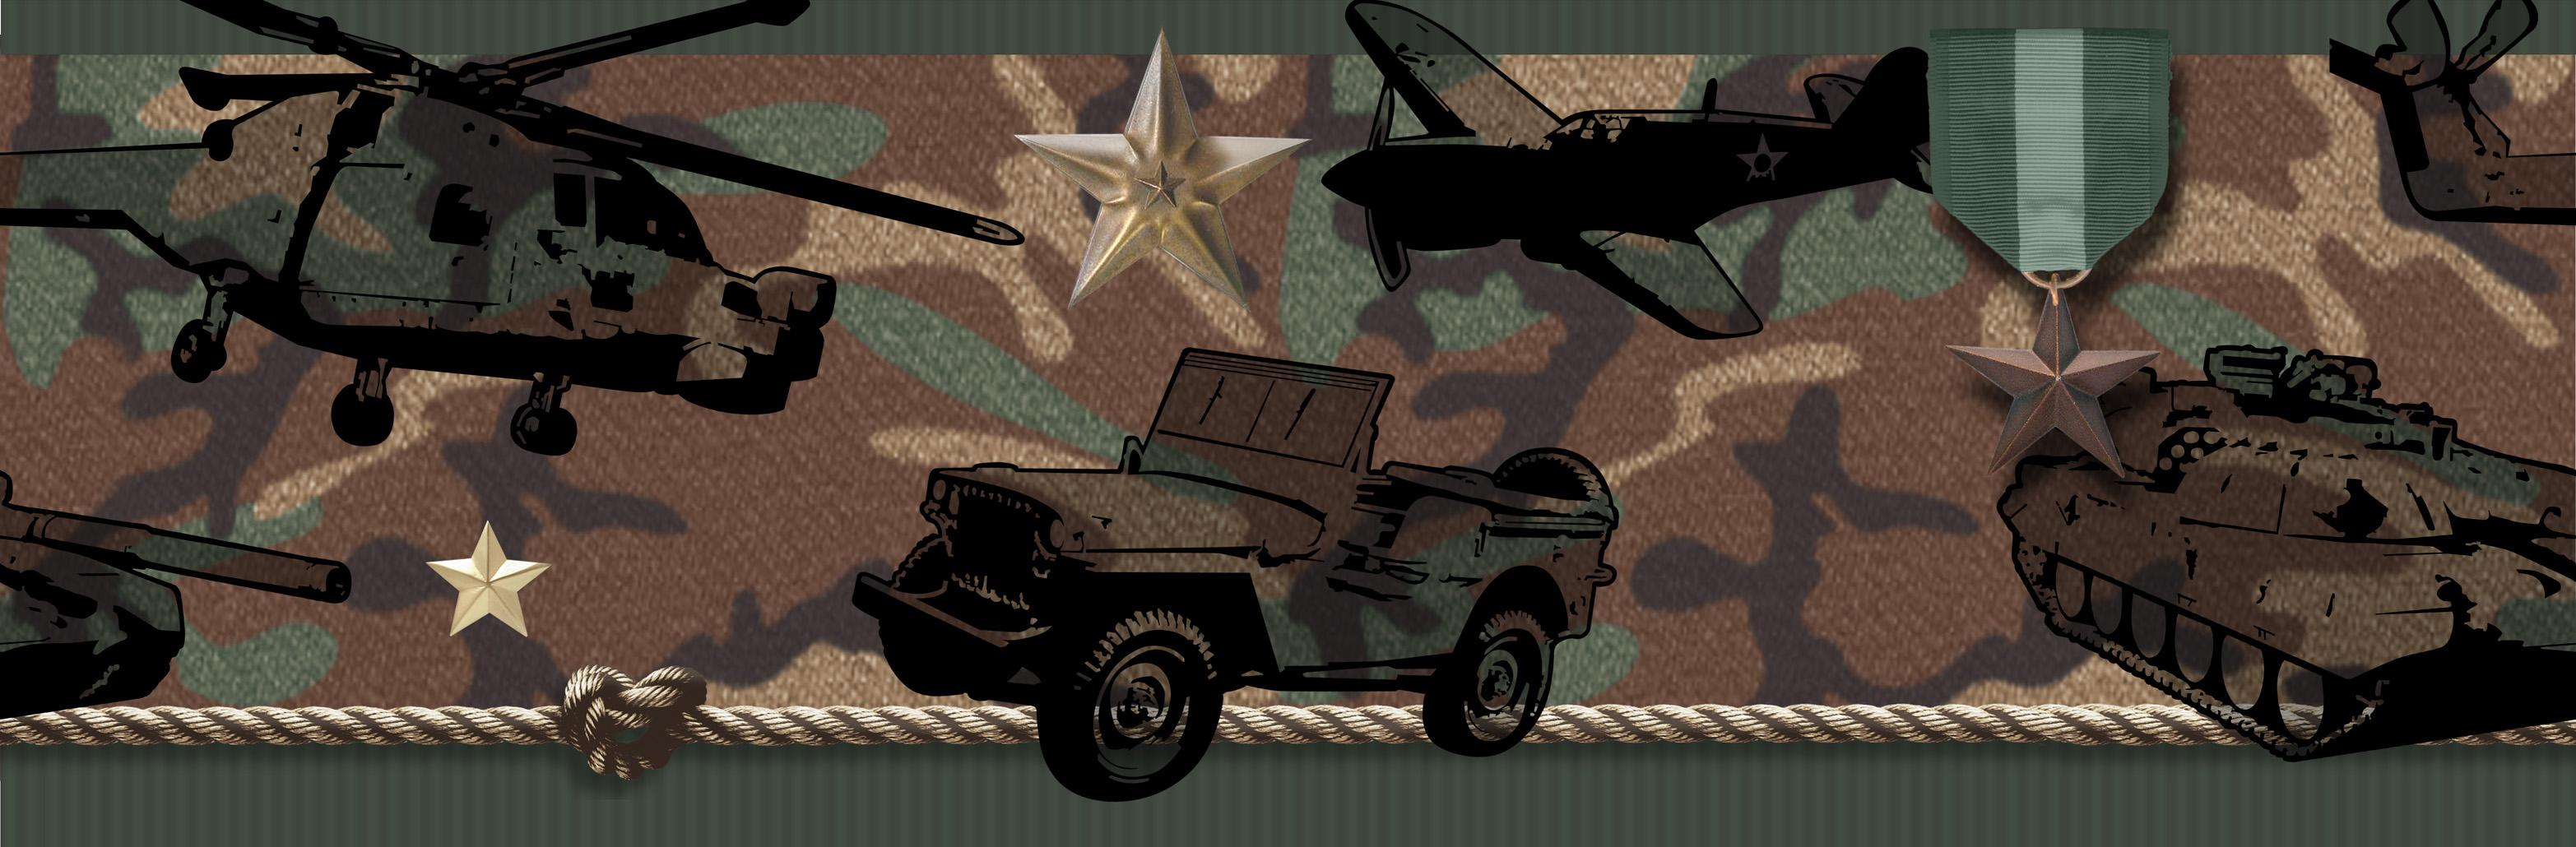 camo wallpaper border 3131x1030